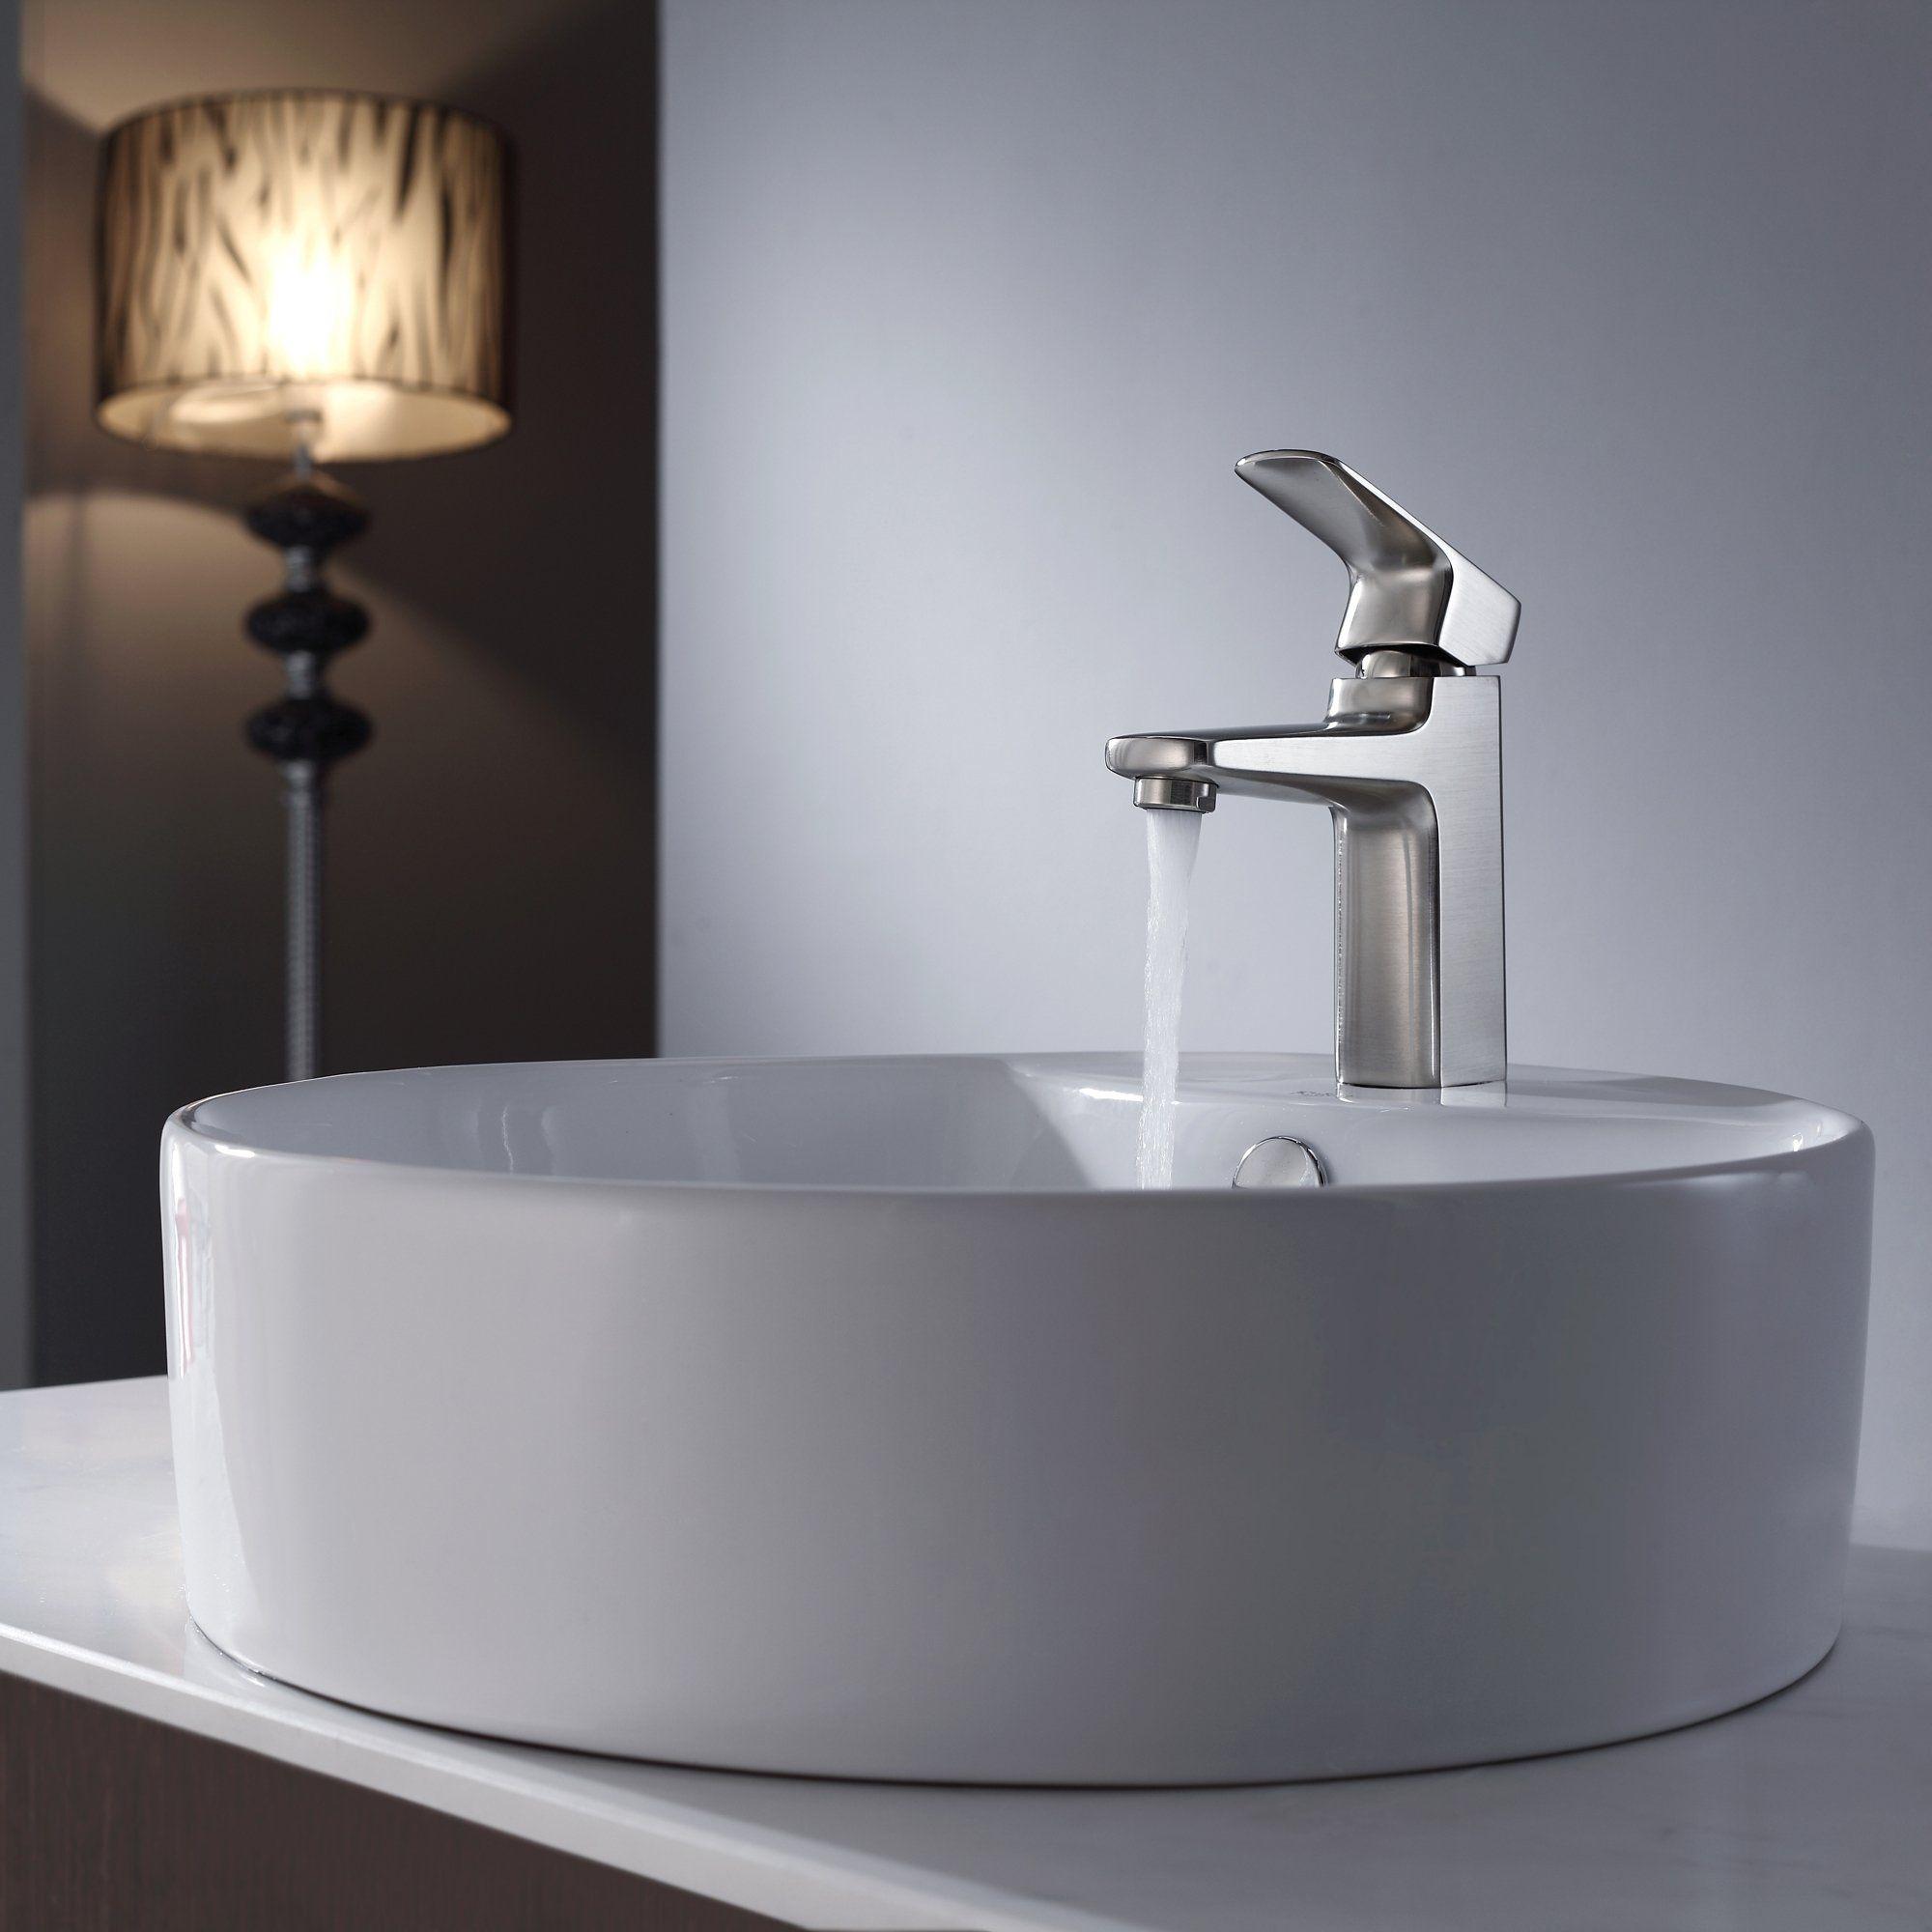 Krs Round Ceramic Vessel Sink In White with Virtus Basin Fcet